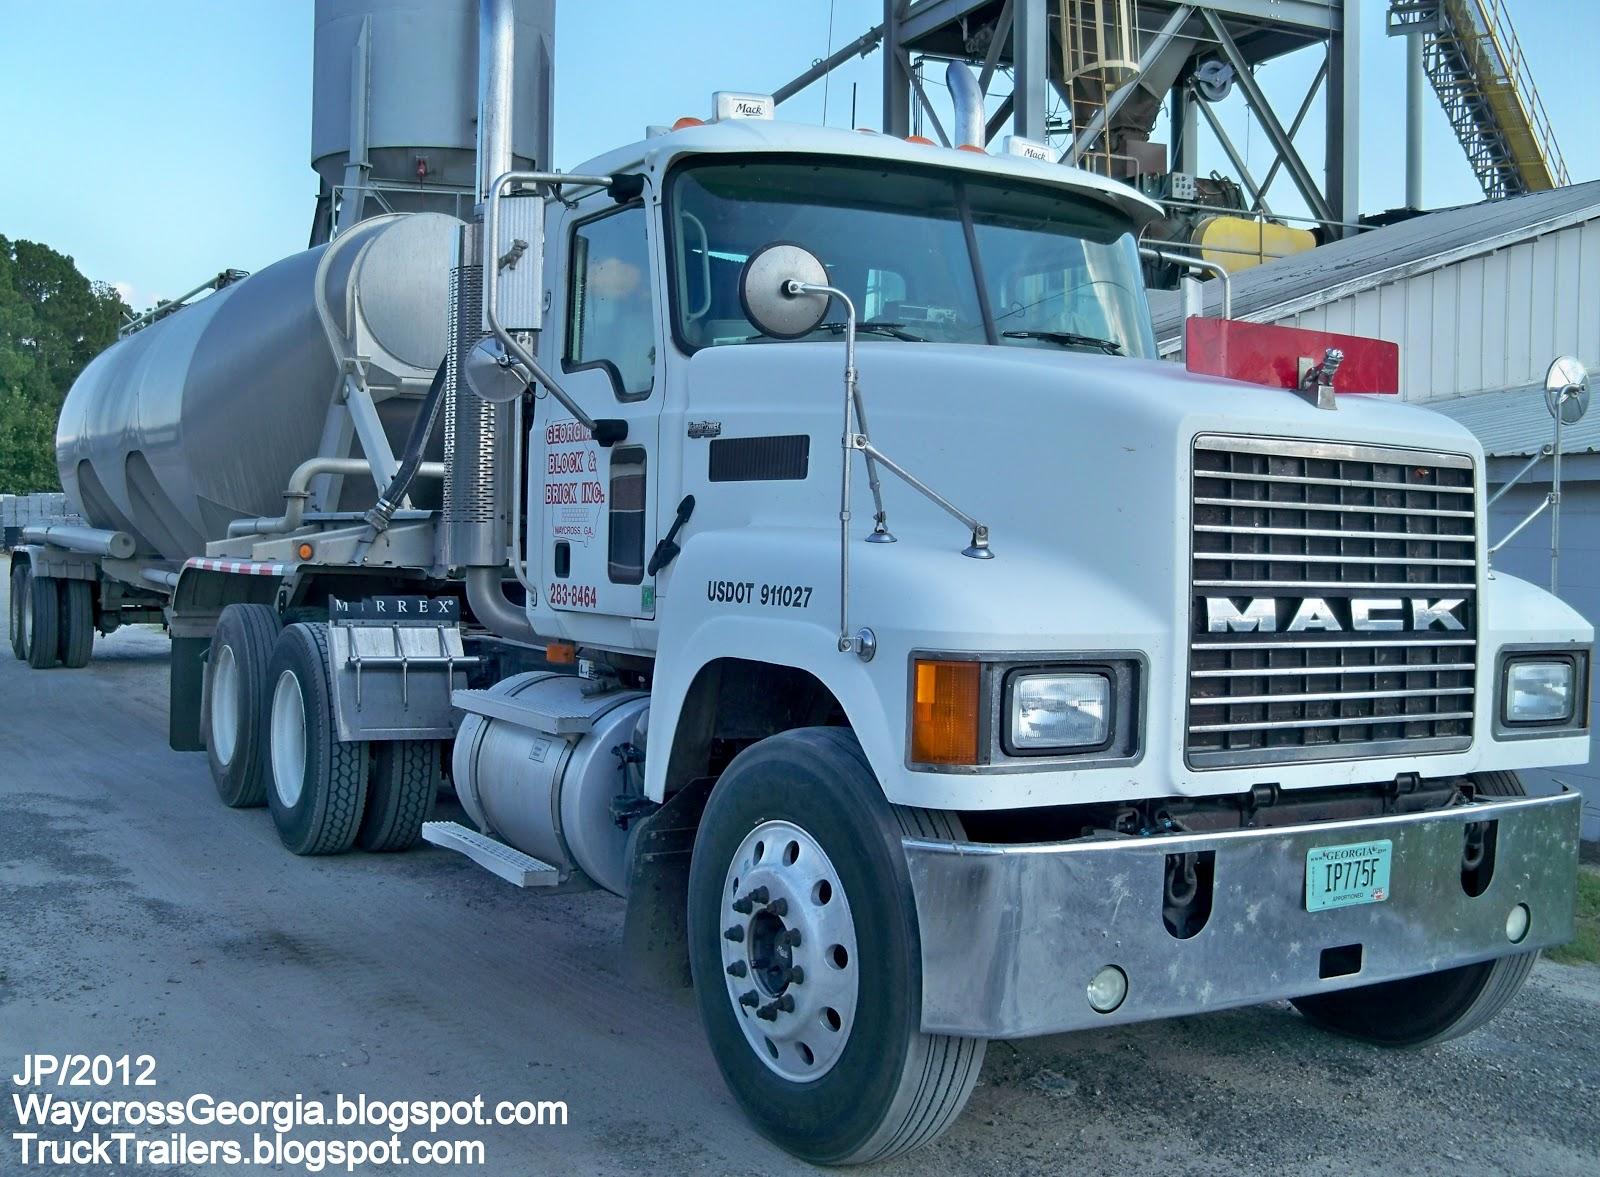 Prostart 2012 International Prostar Eagle Fuse Box Truck Trailer Transport Express Freight Logistic Diesel Mack 1600x1177